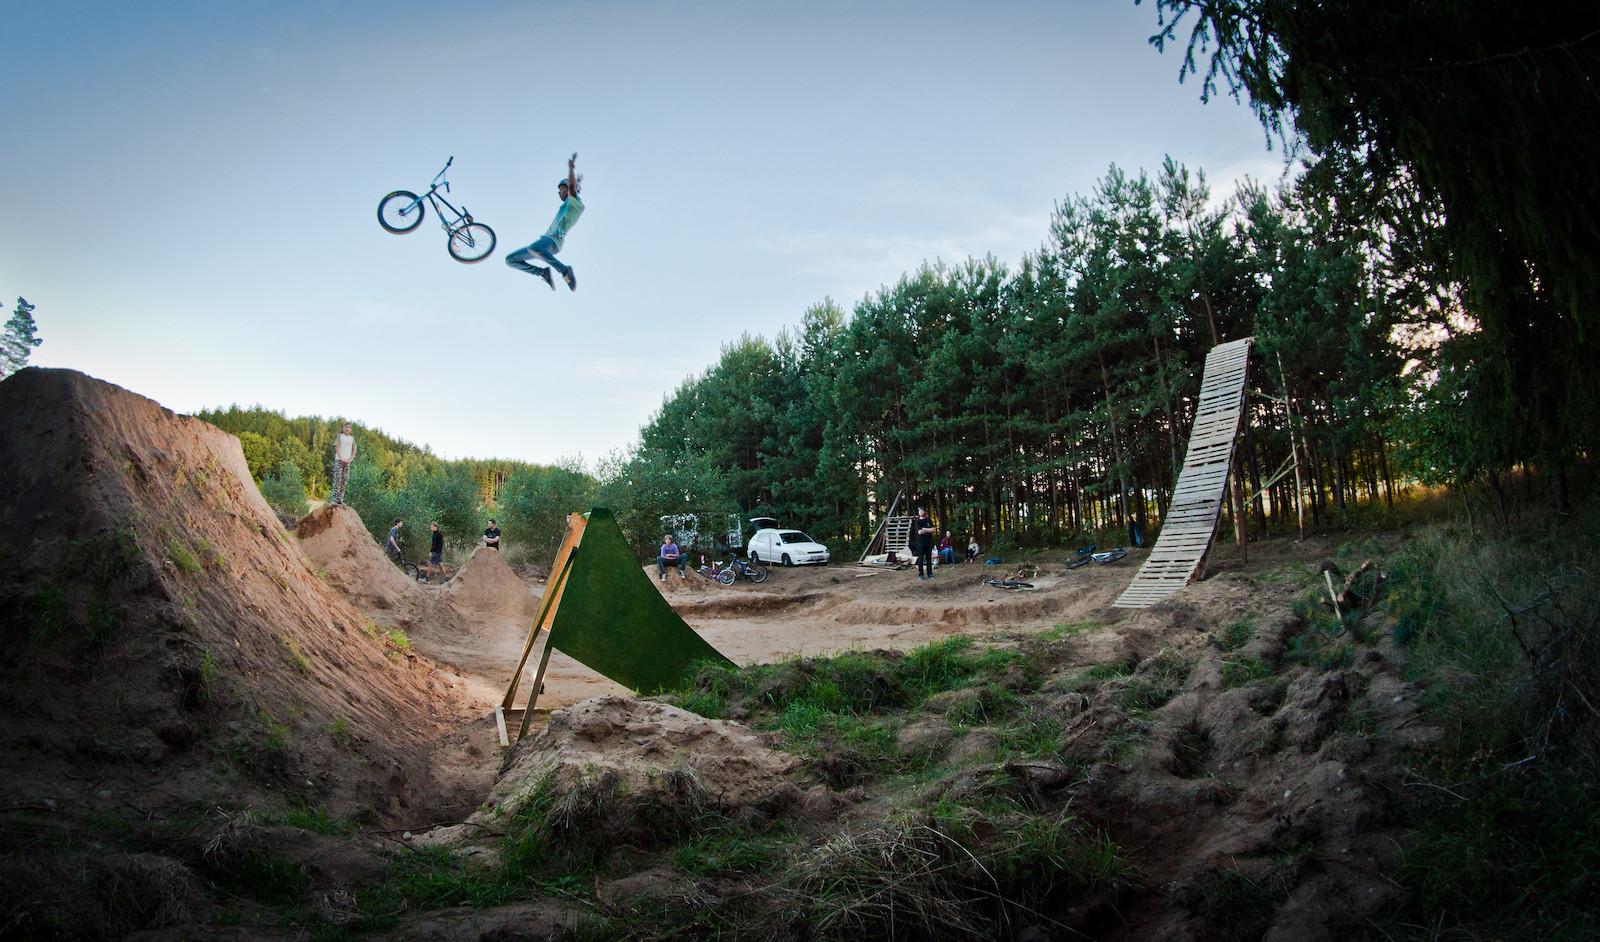 Testing new jumps - Dambak - Mountain Biking Pictures - Vital MTB